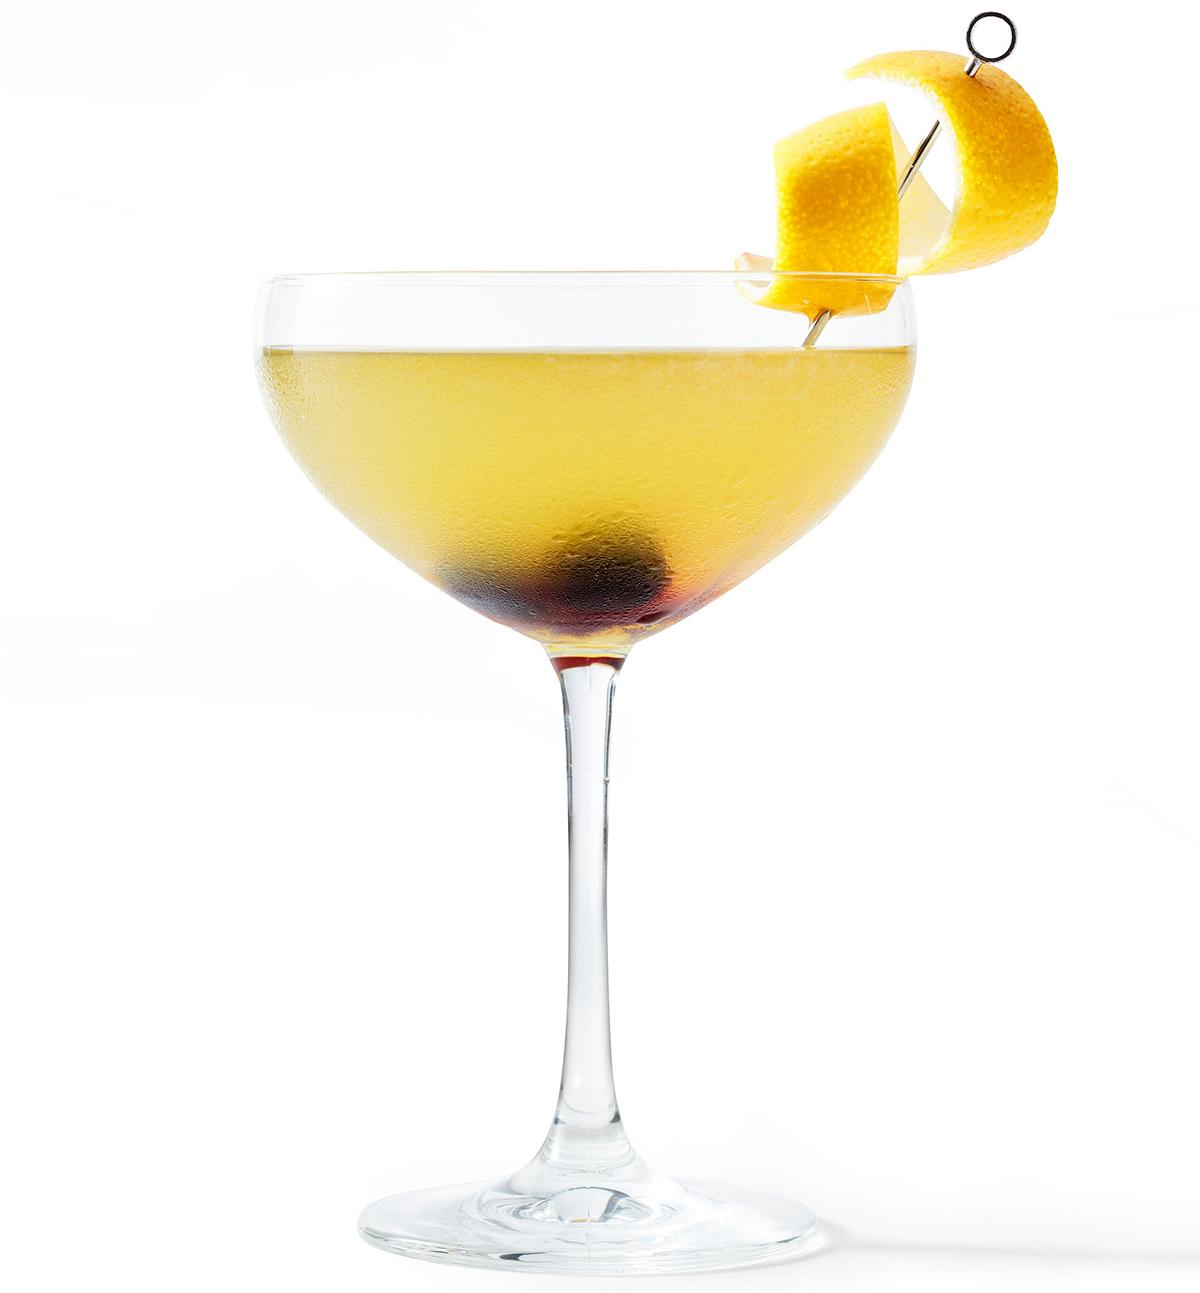 john's james joyce cocktail with peel garnish